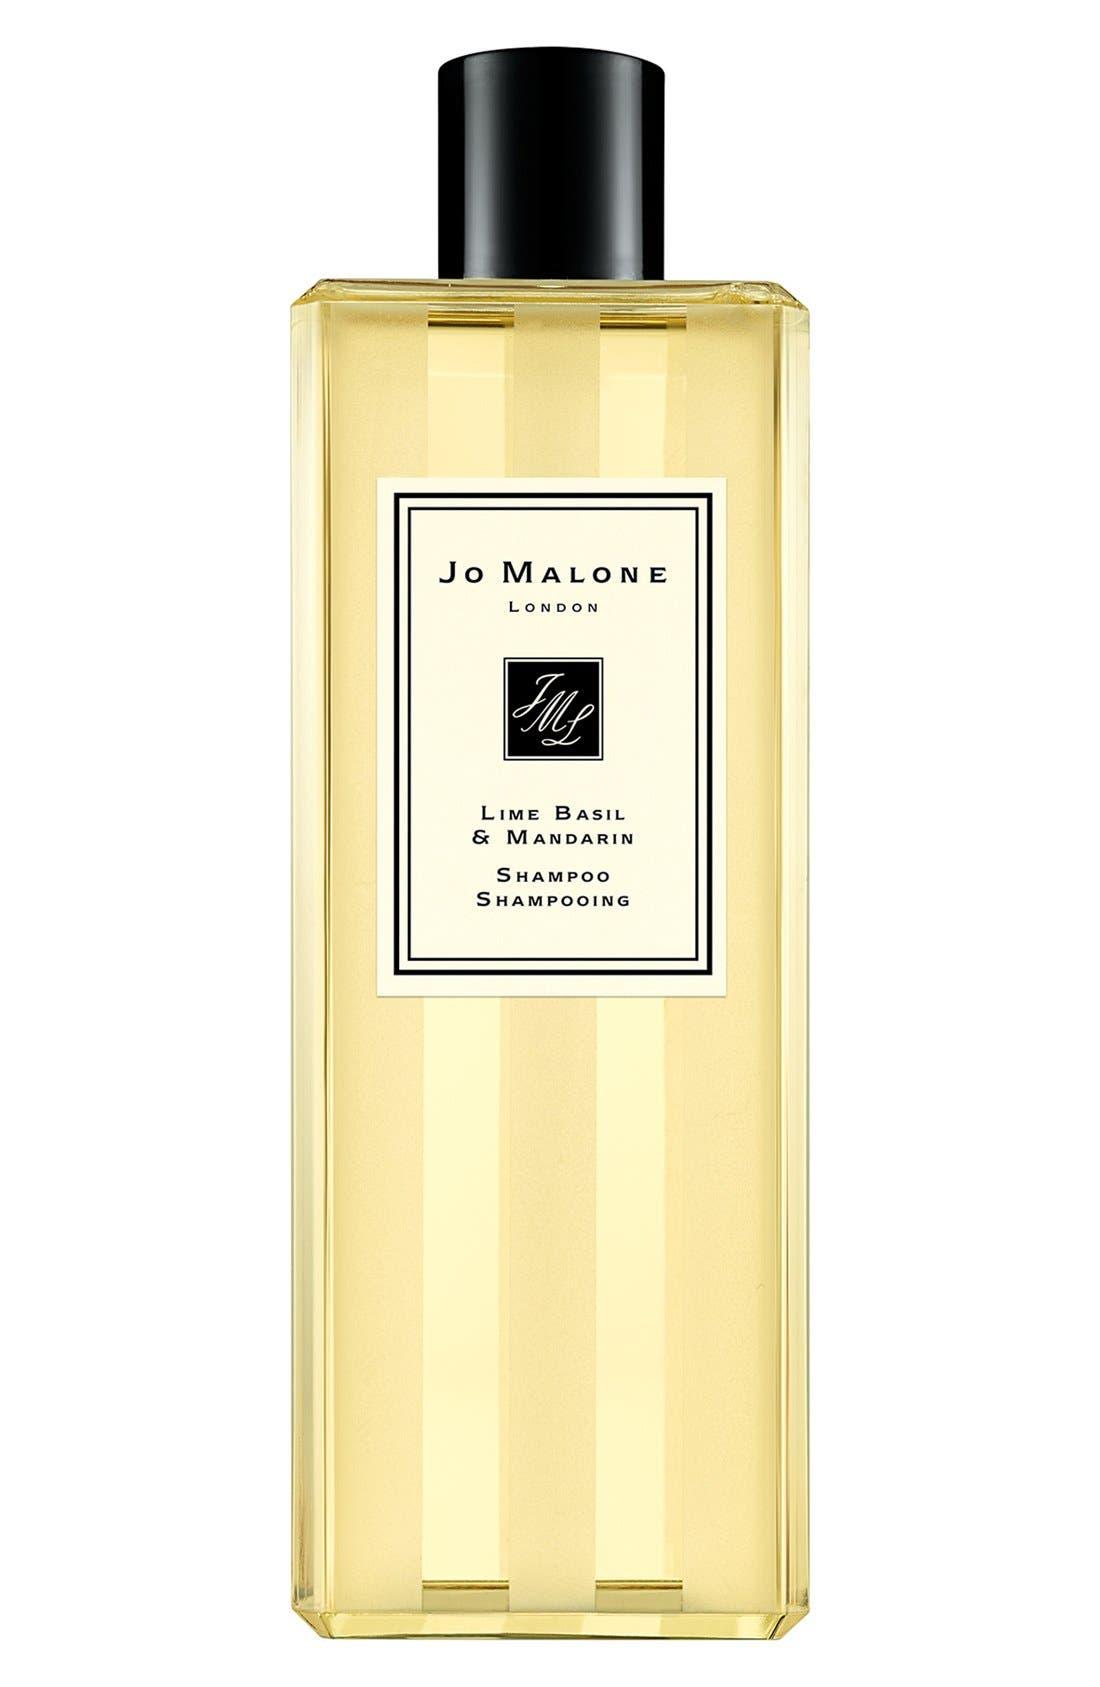 Jo Malone London™ 'Lime Basil & Mandarin' Shampoo